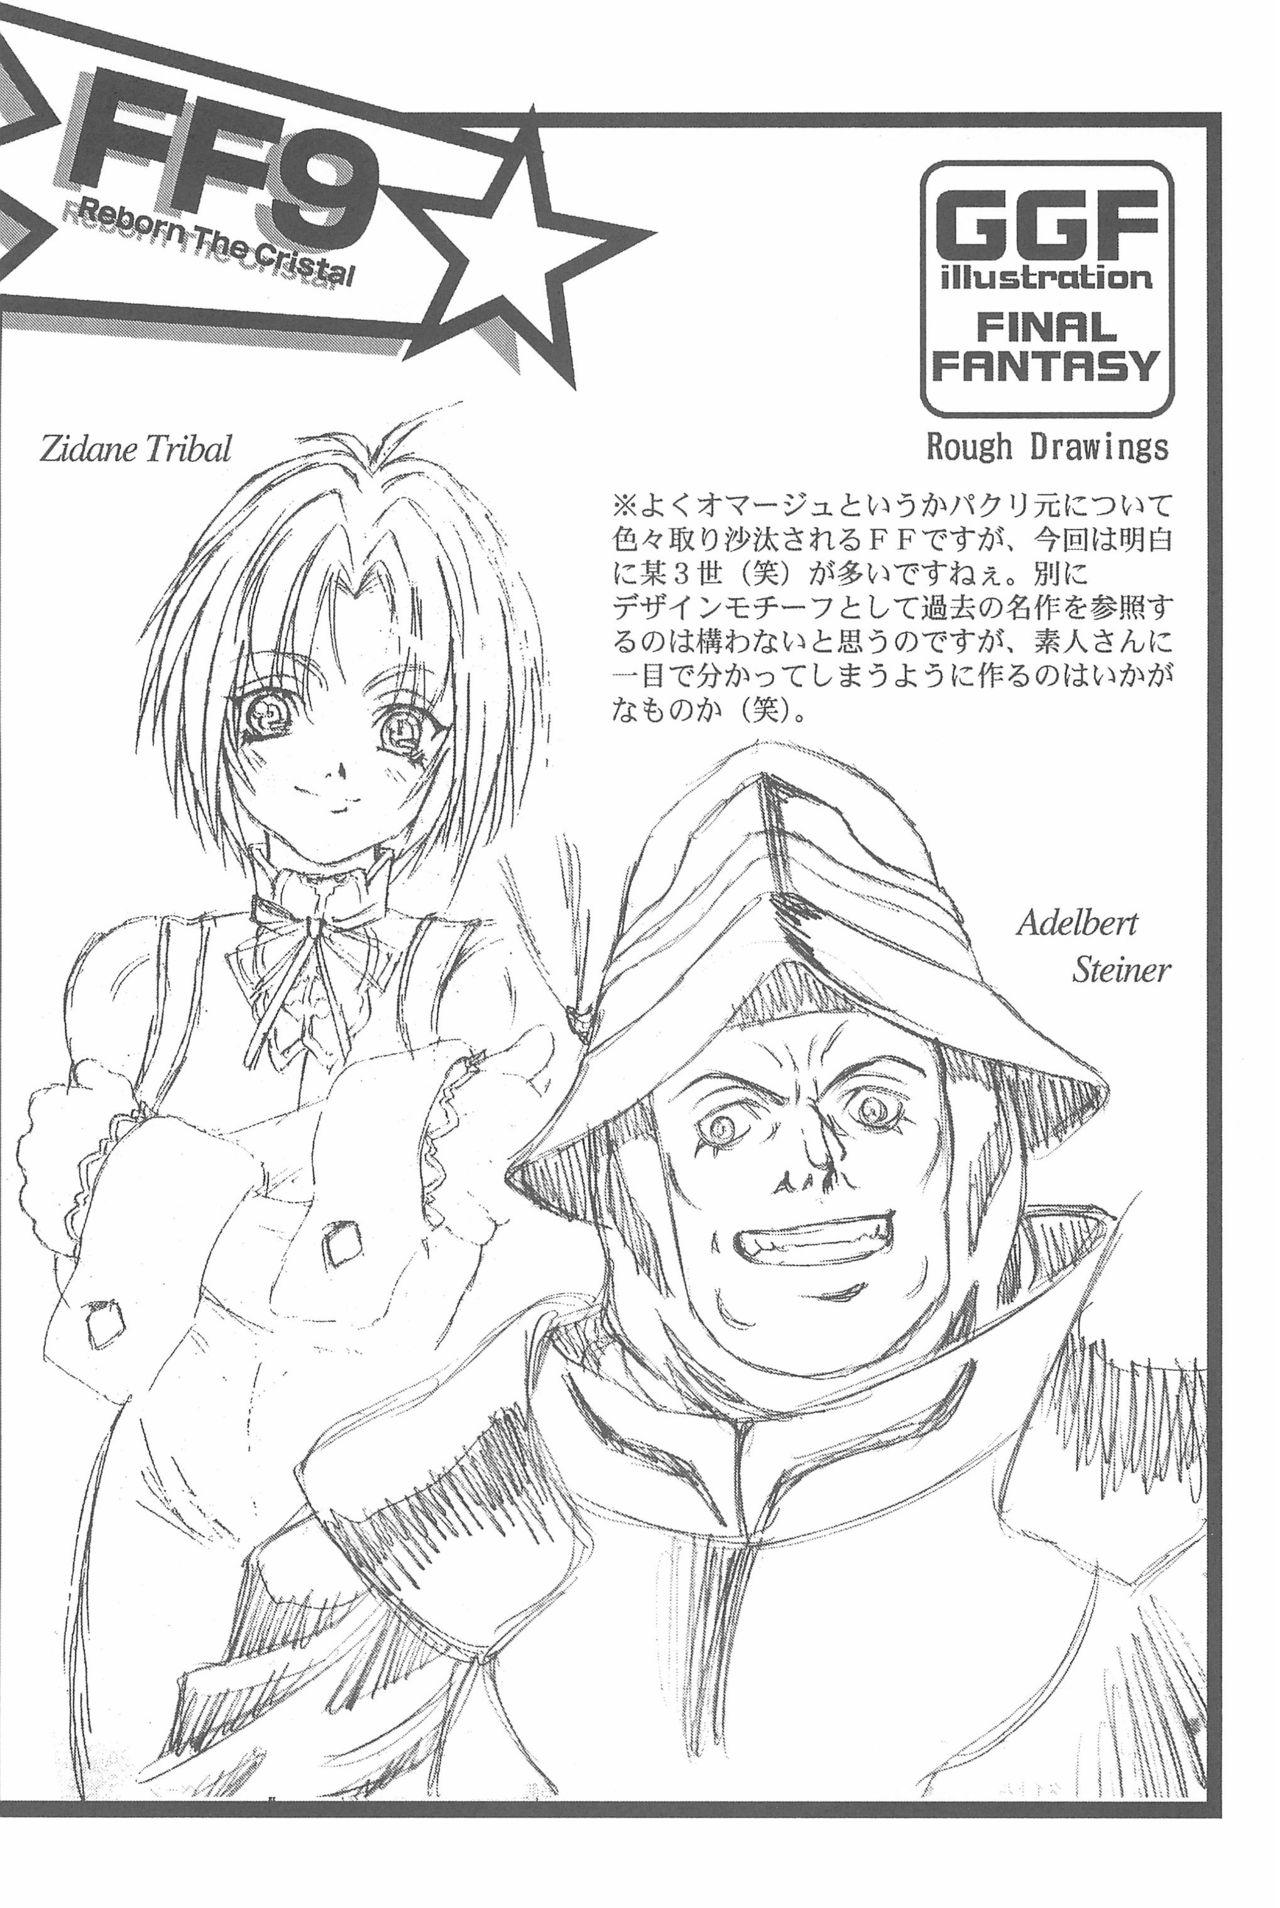 Game Giga Fantasy 3 25